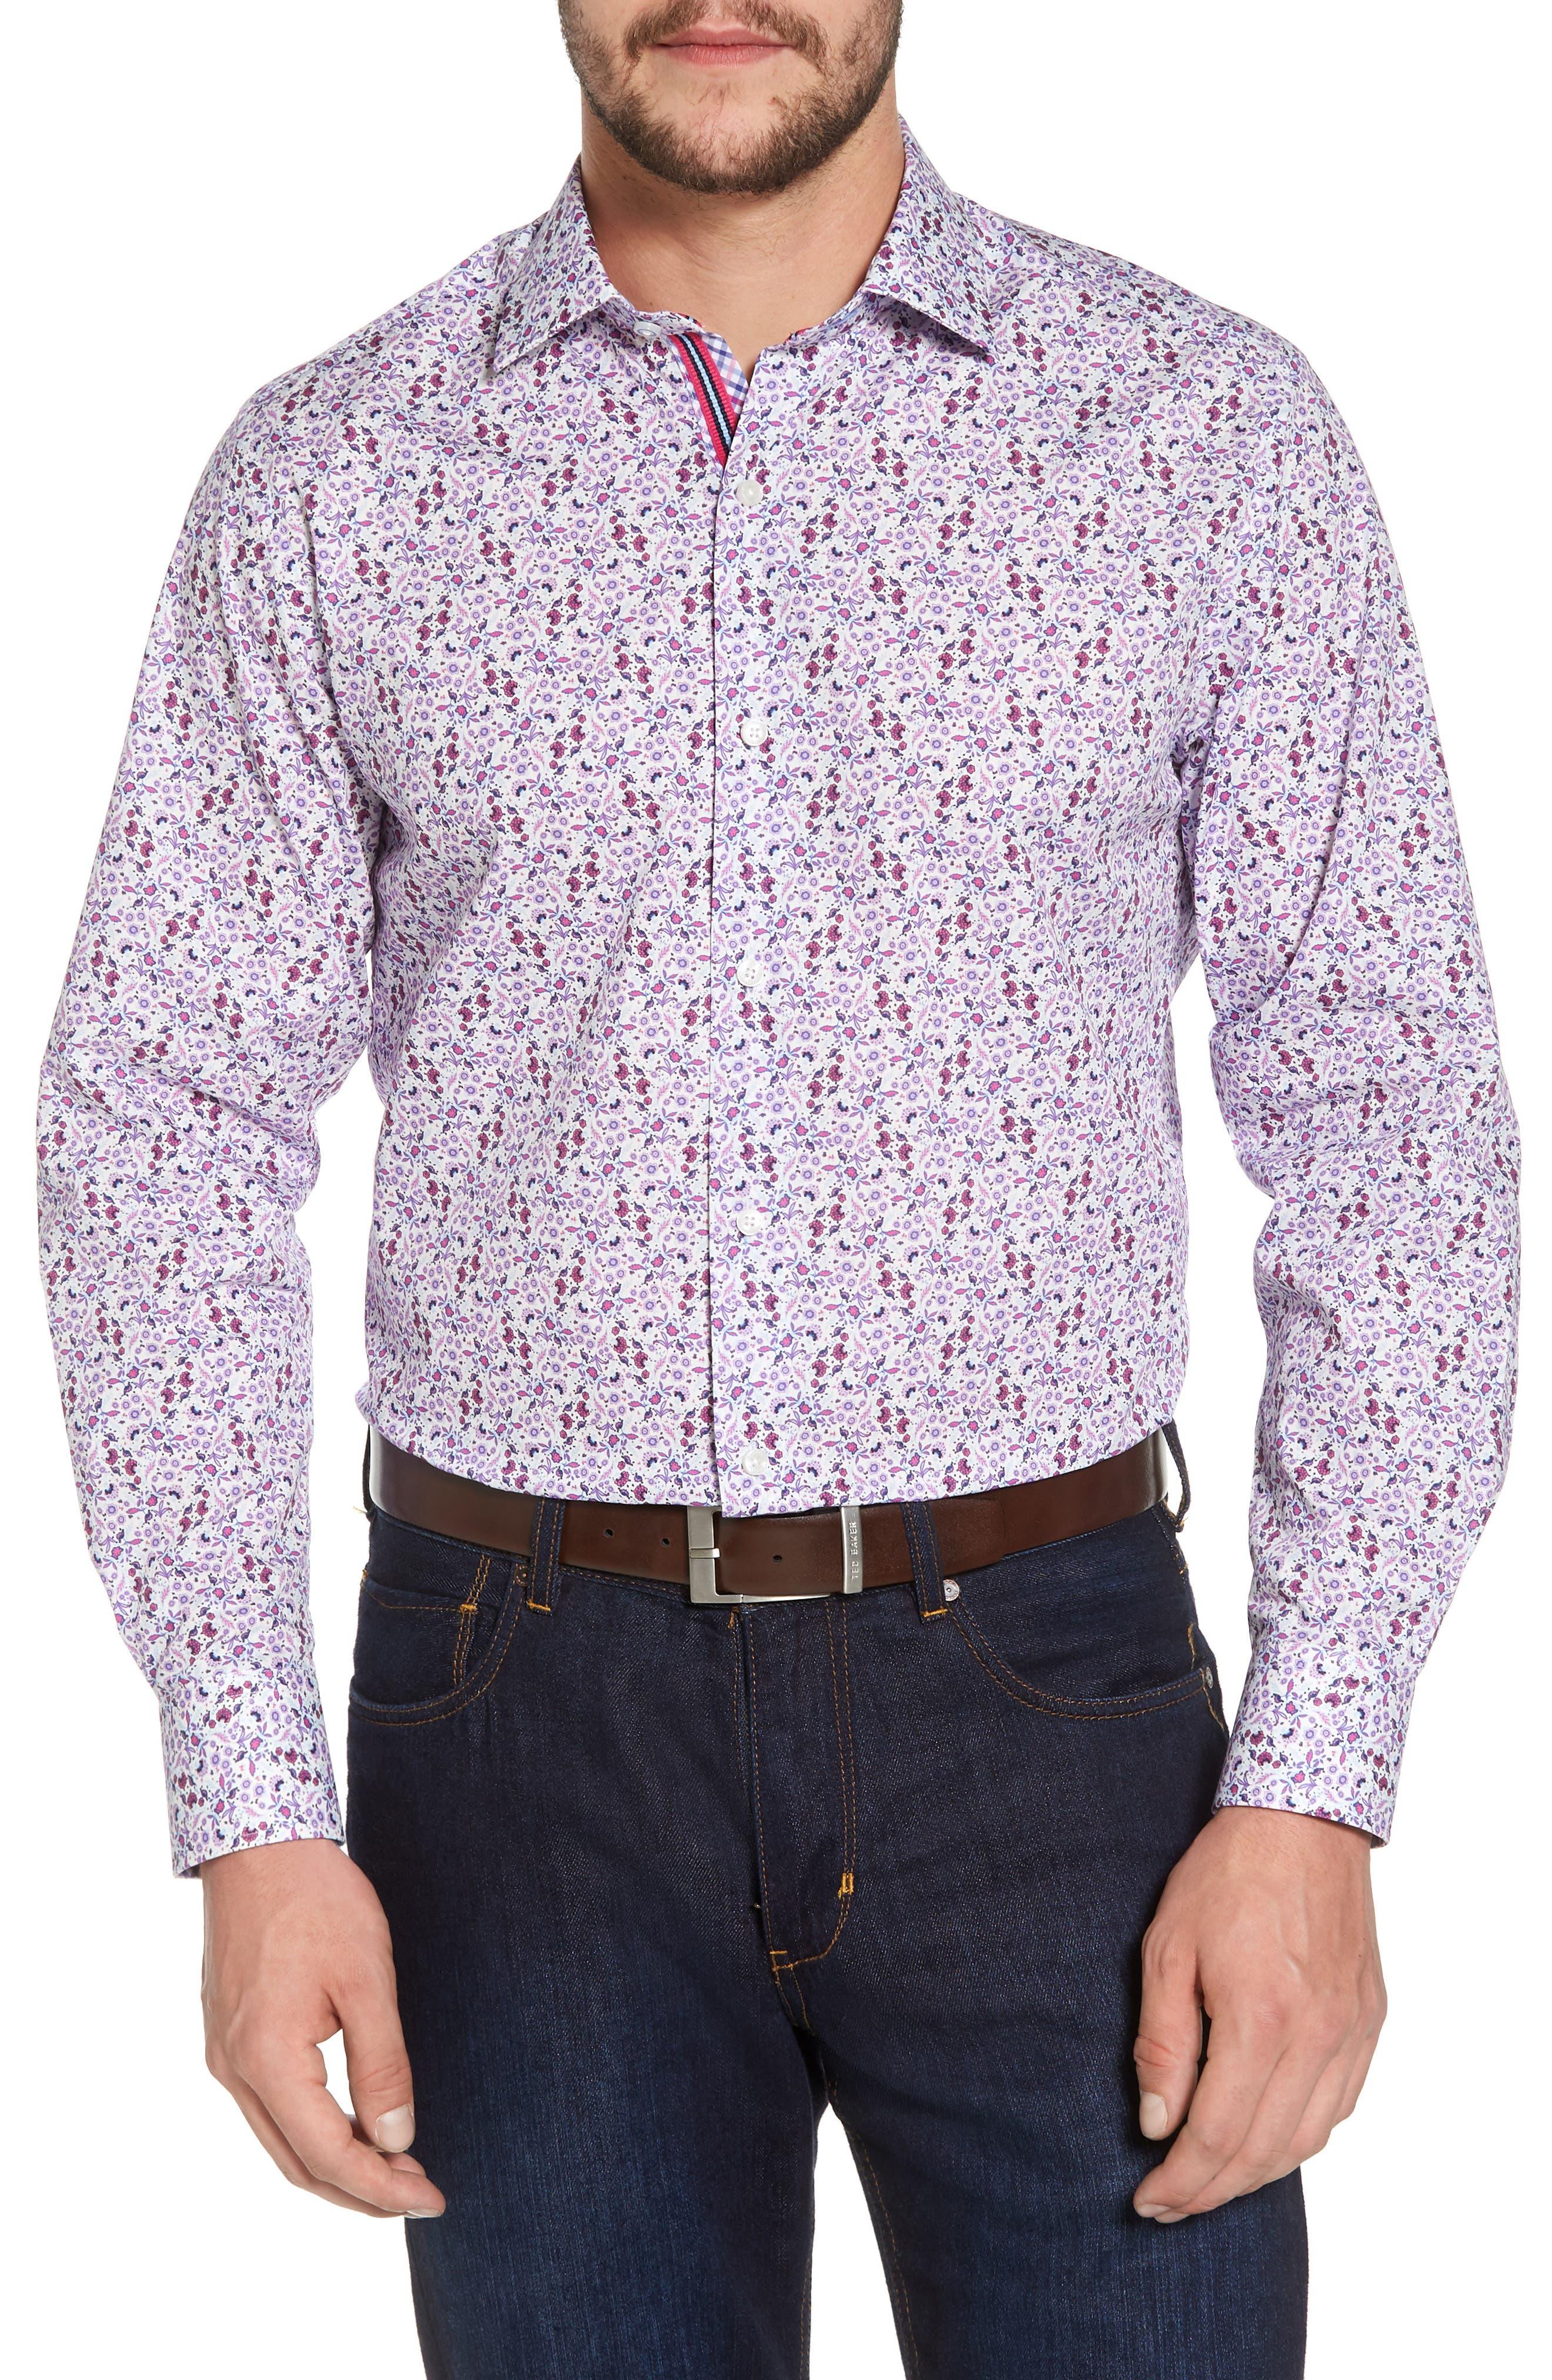 Kaj Regular Fit Floral Print Sport Shirt,                         Main,                         color, Fuchsia